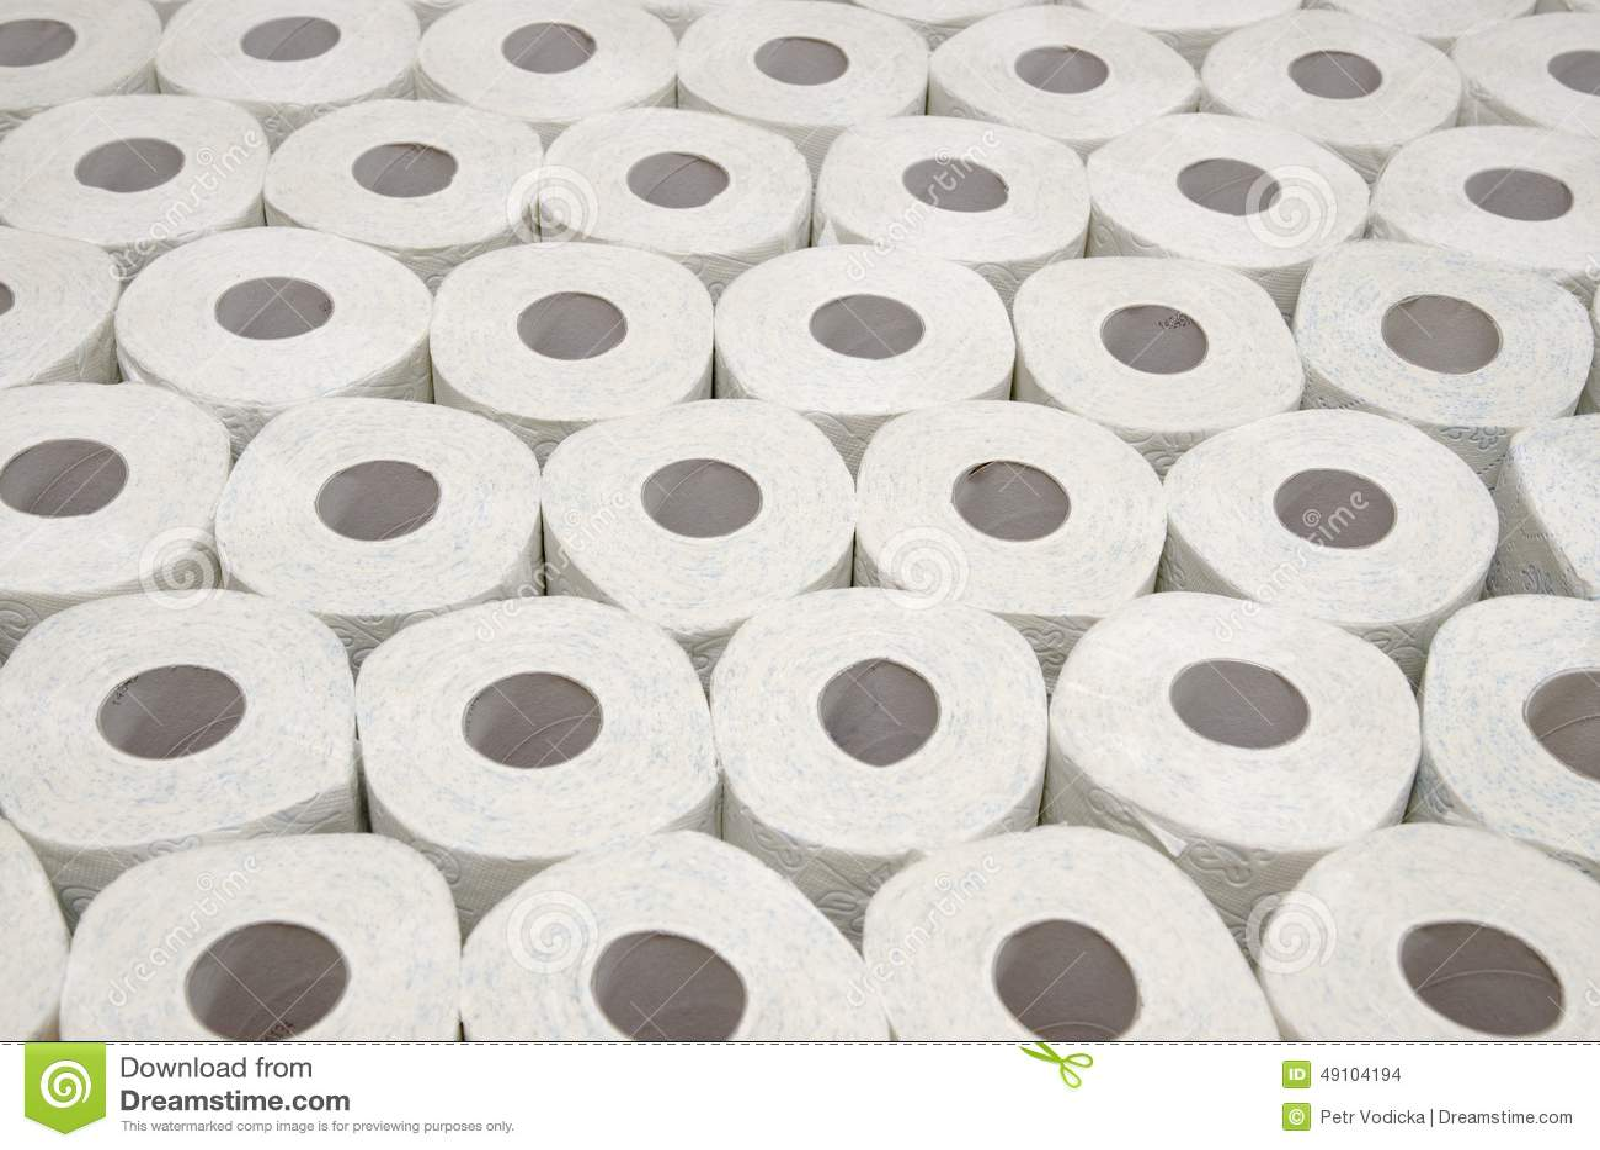 Toilet Paper Stock Photo Image 49104194